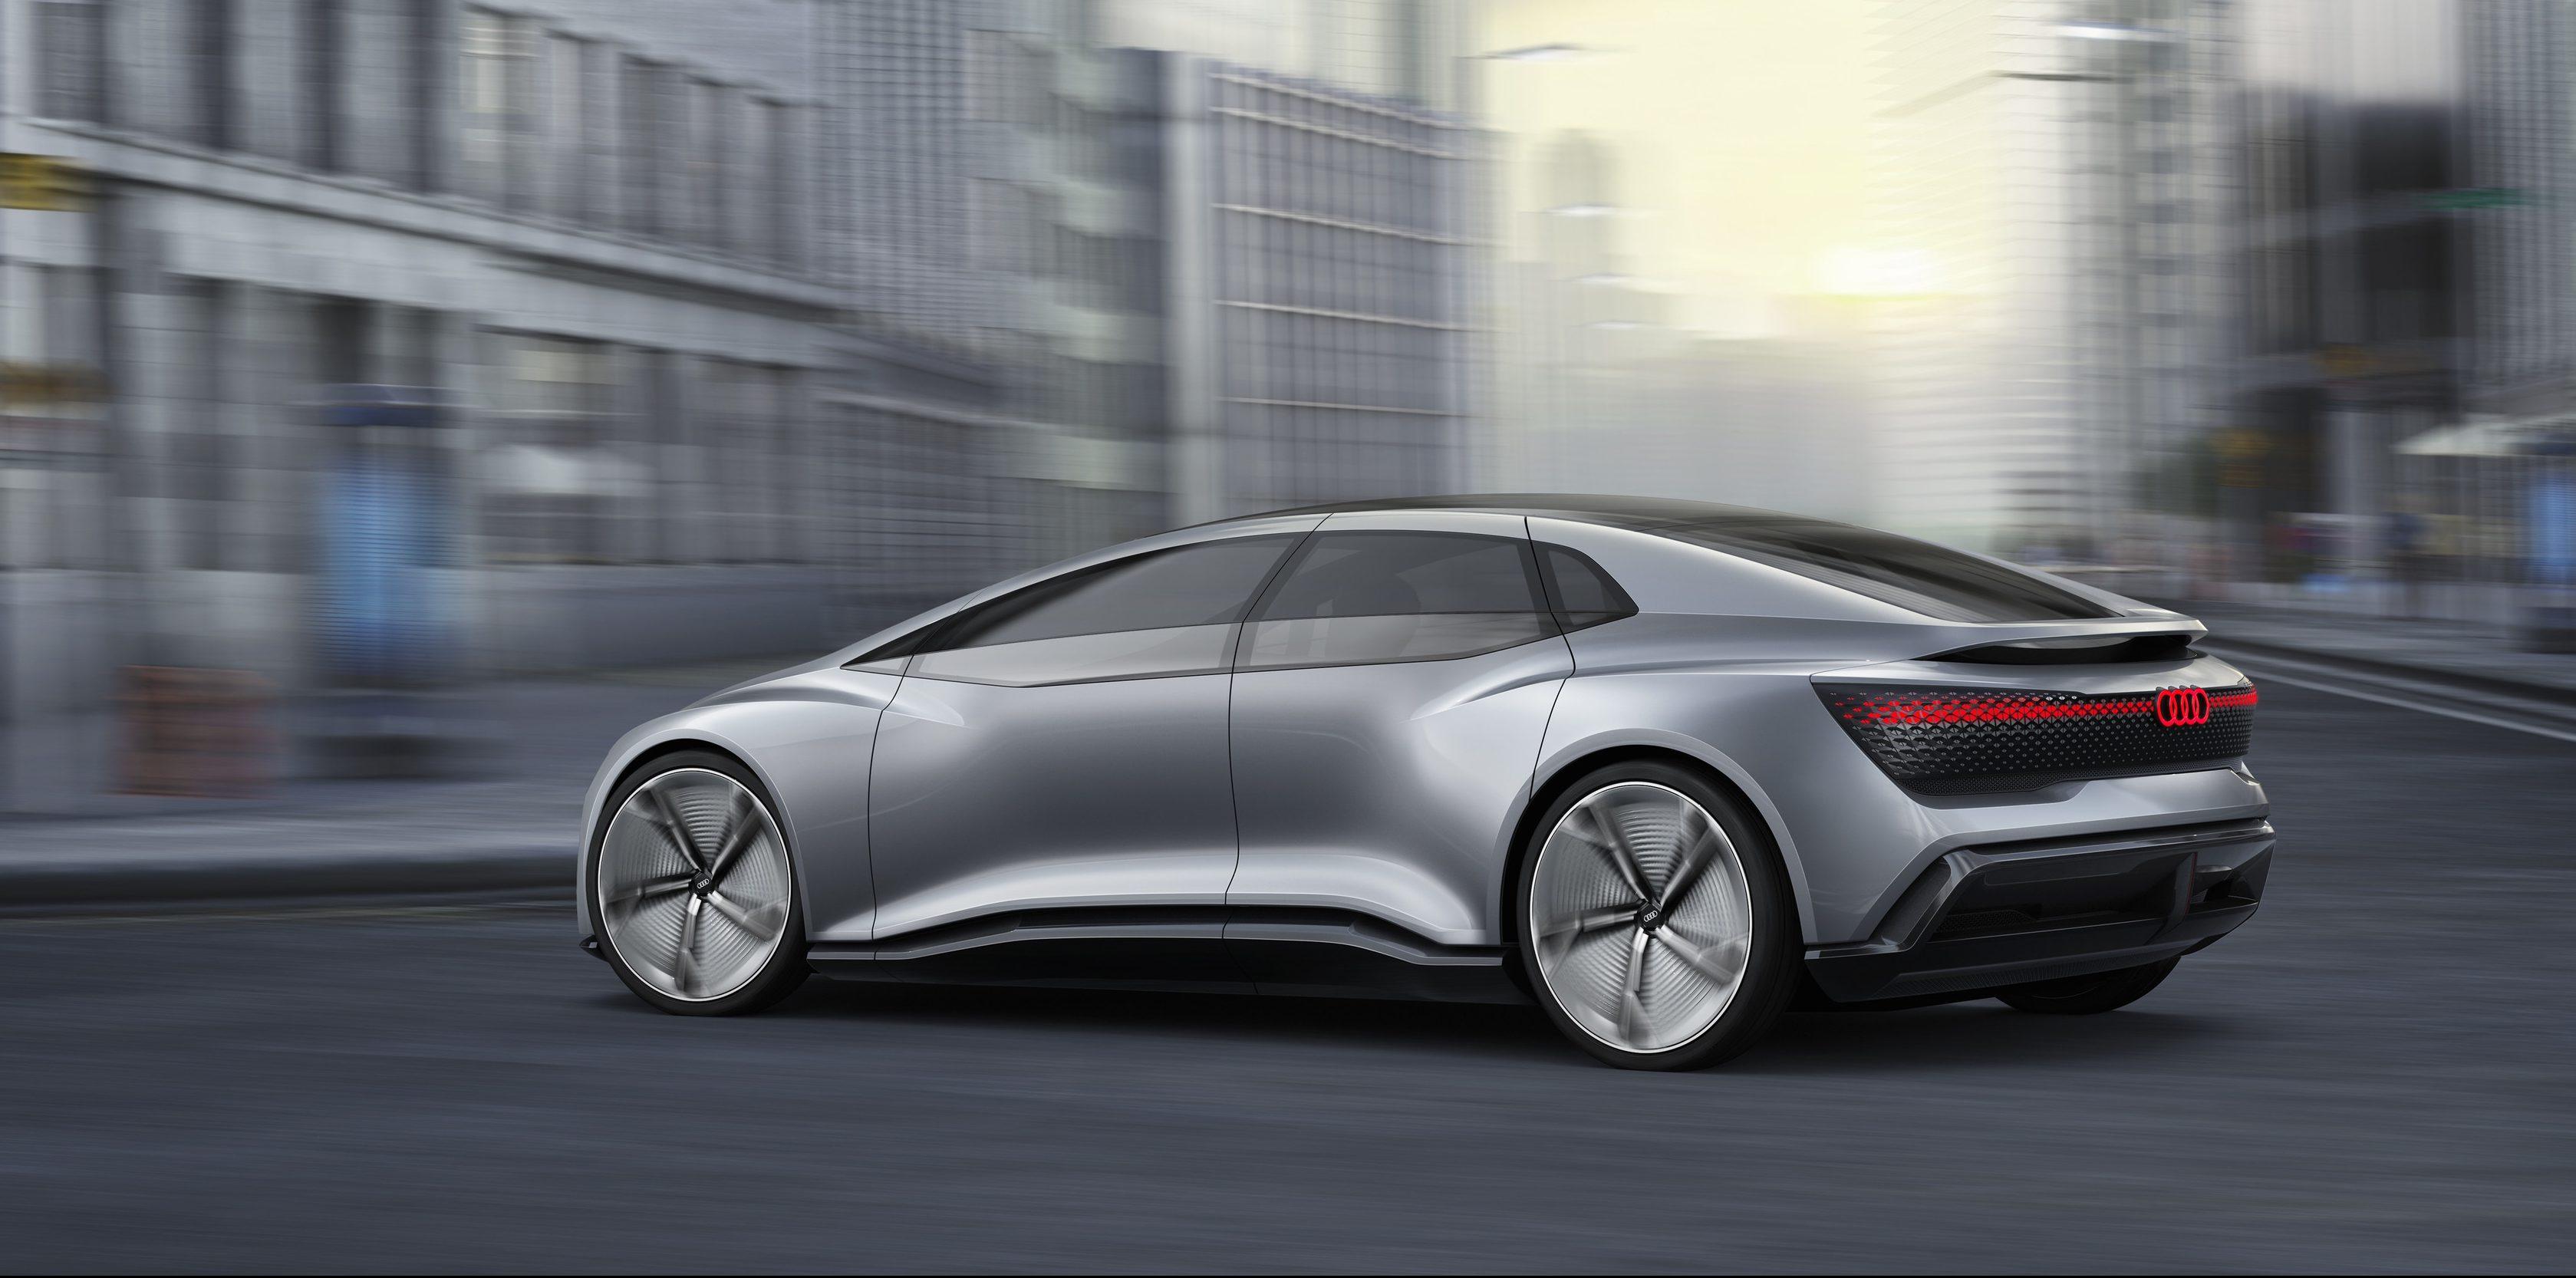 Audi Unveils New All Electric Autonomous Car Concept With Up To 500 Miles Of Range Electrek